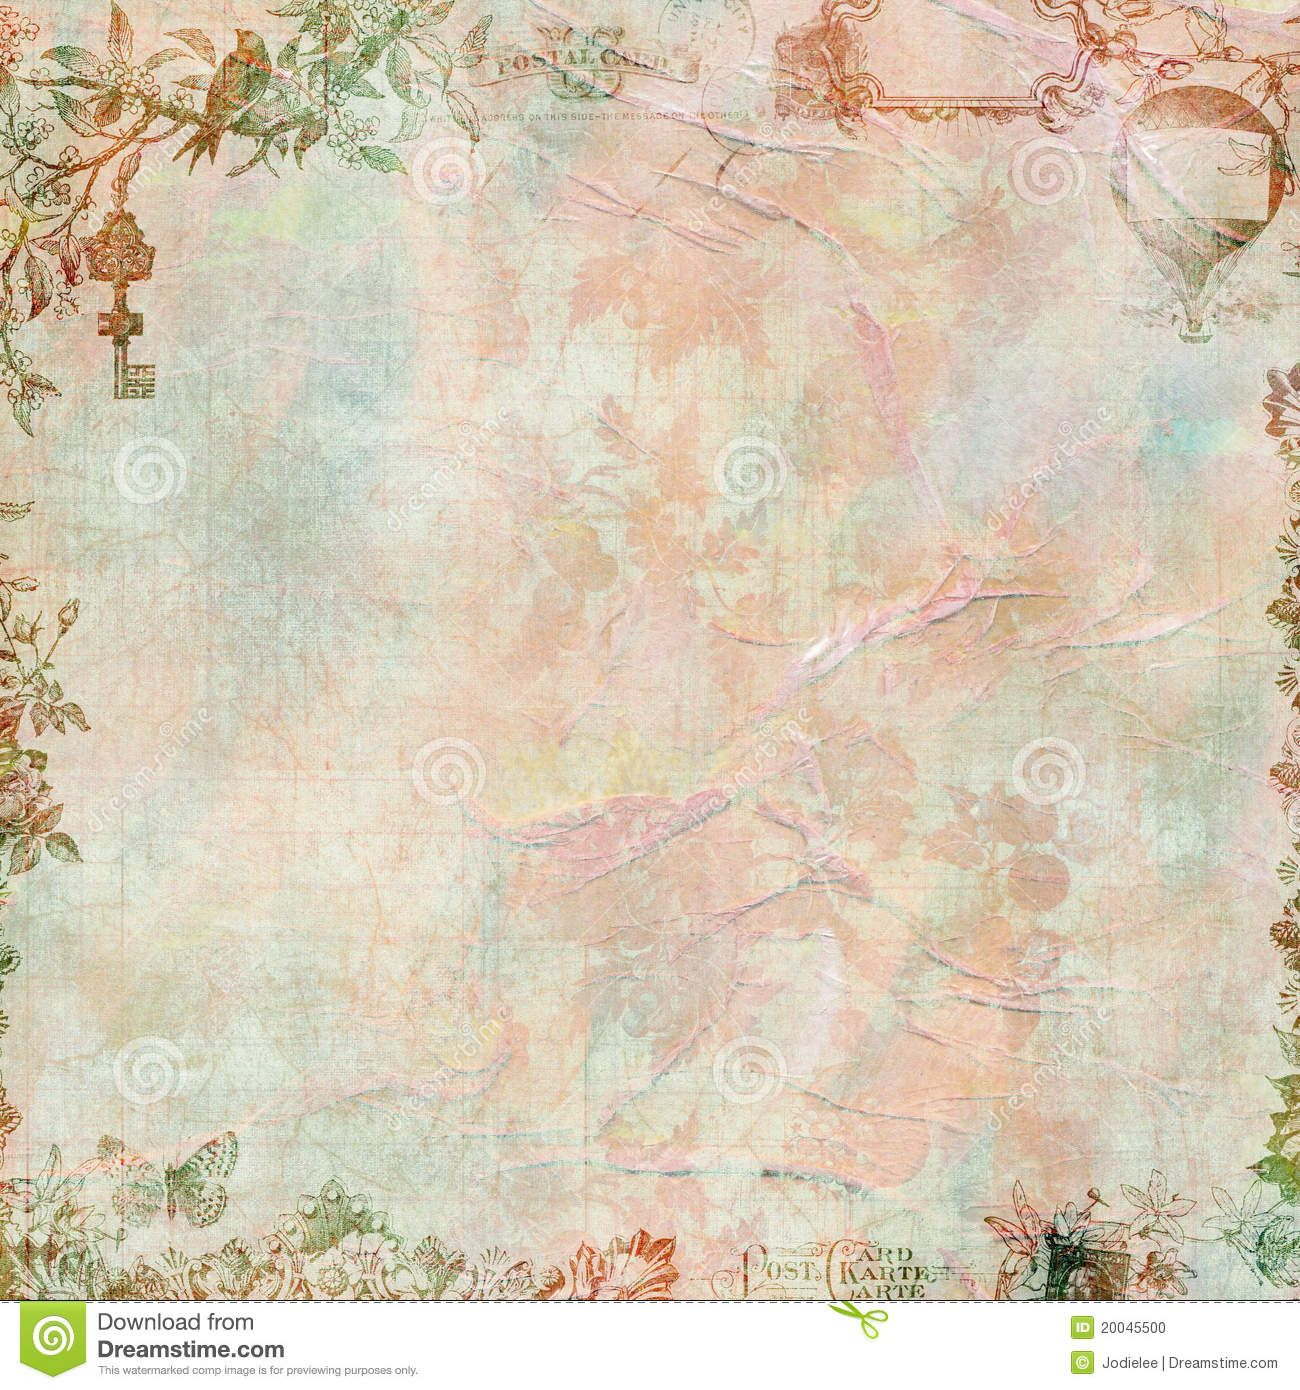 Pastel Grungy Vintage Floral Scrapbook Frame Download From Over 26